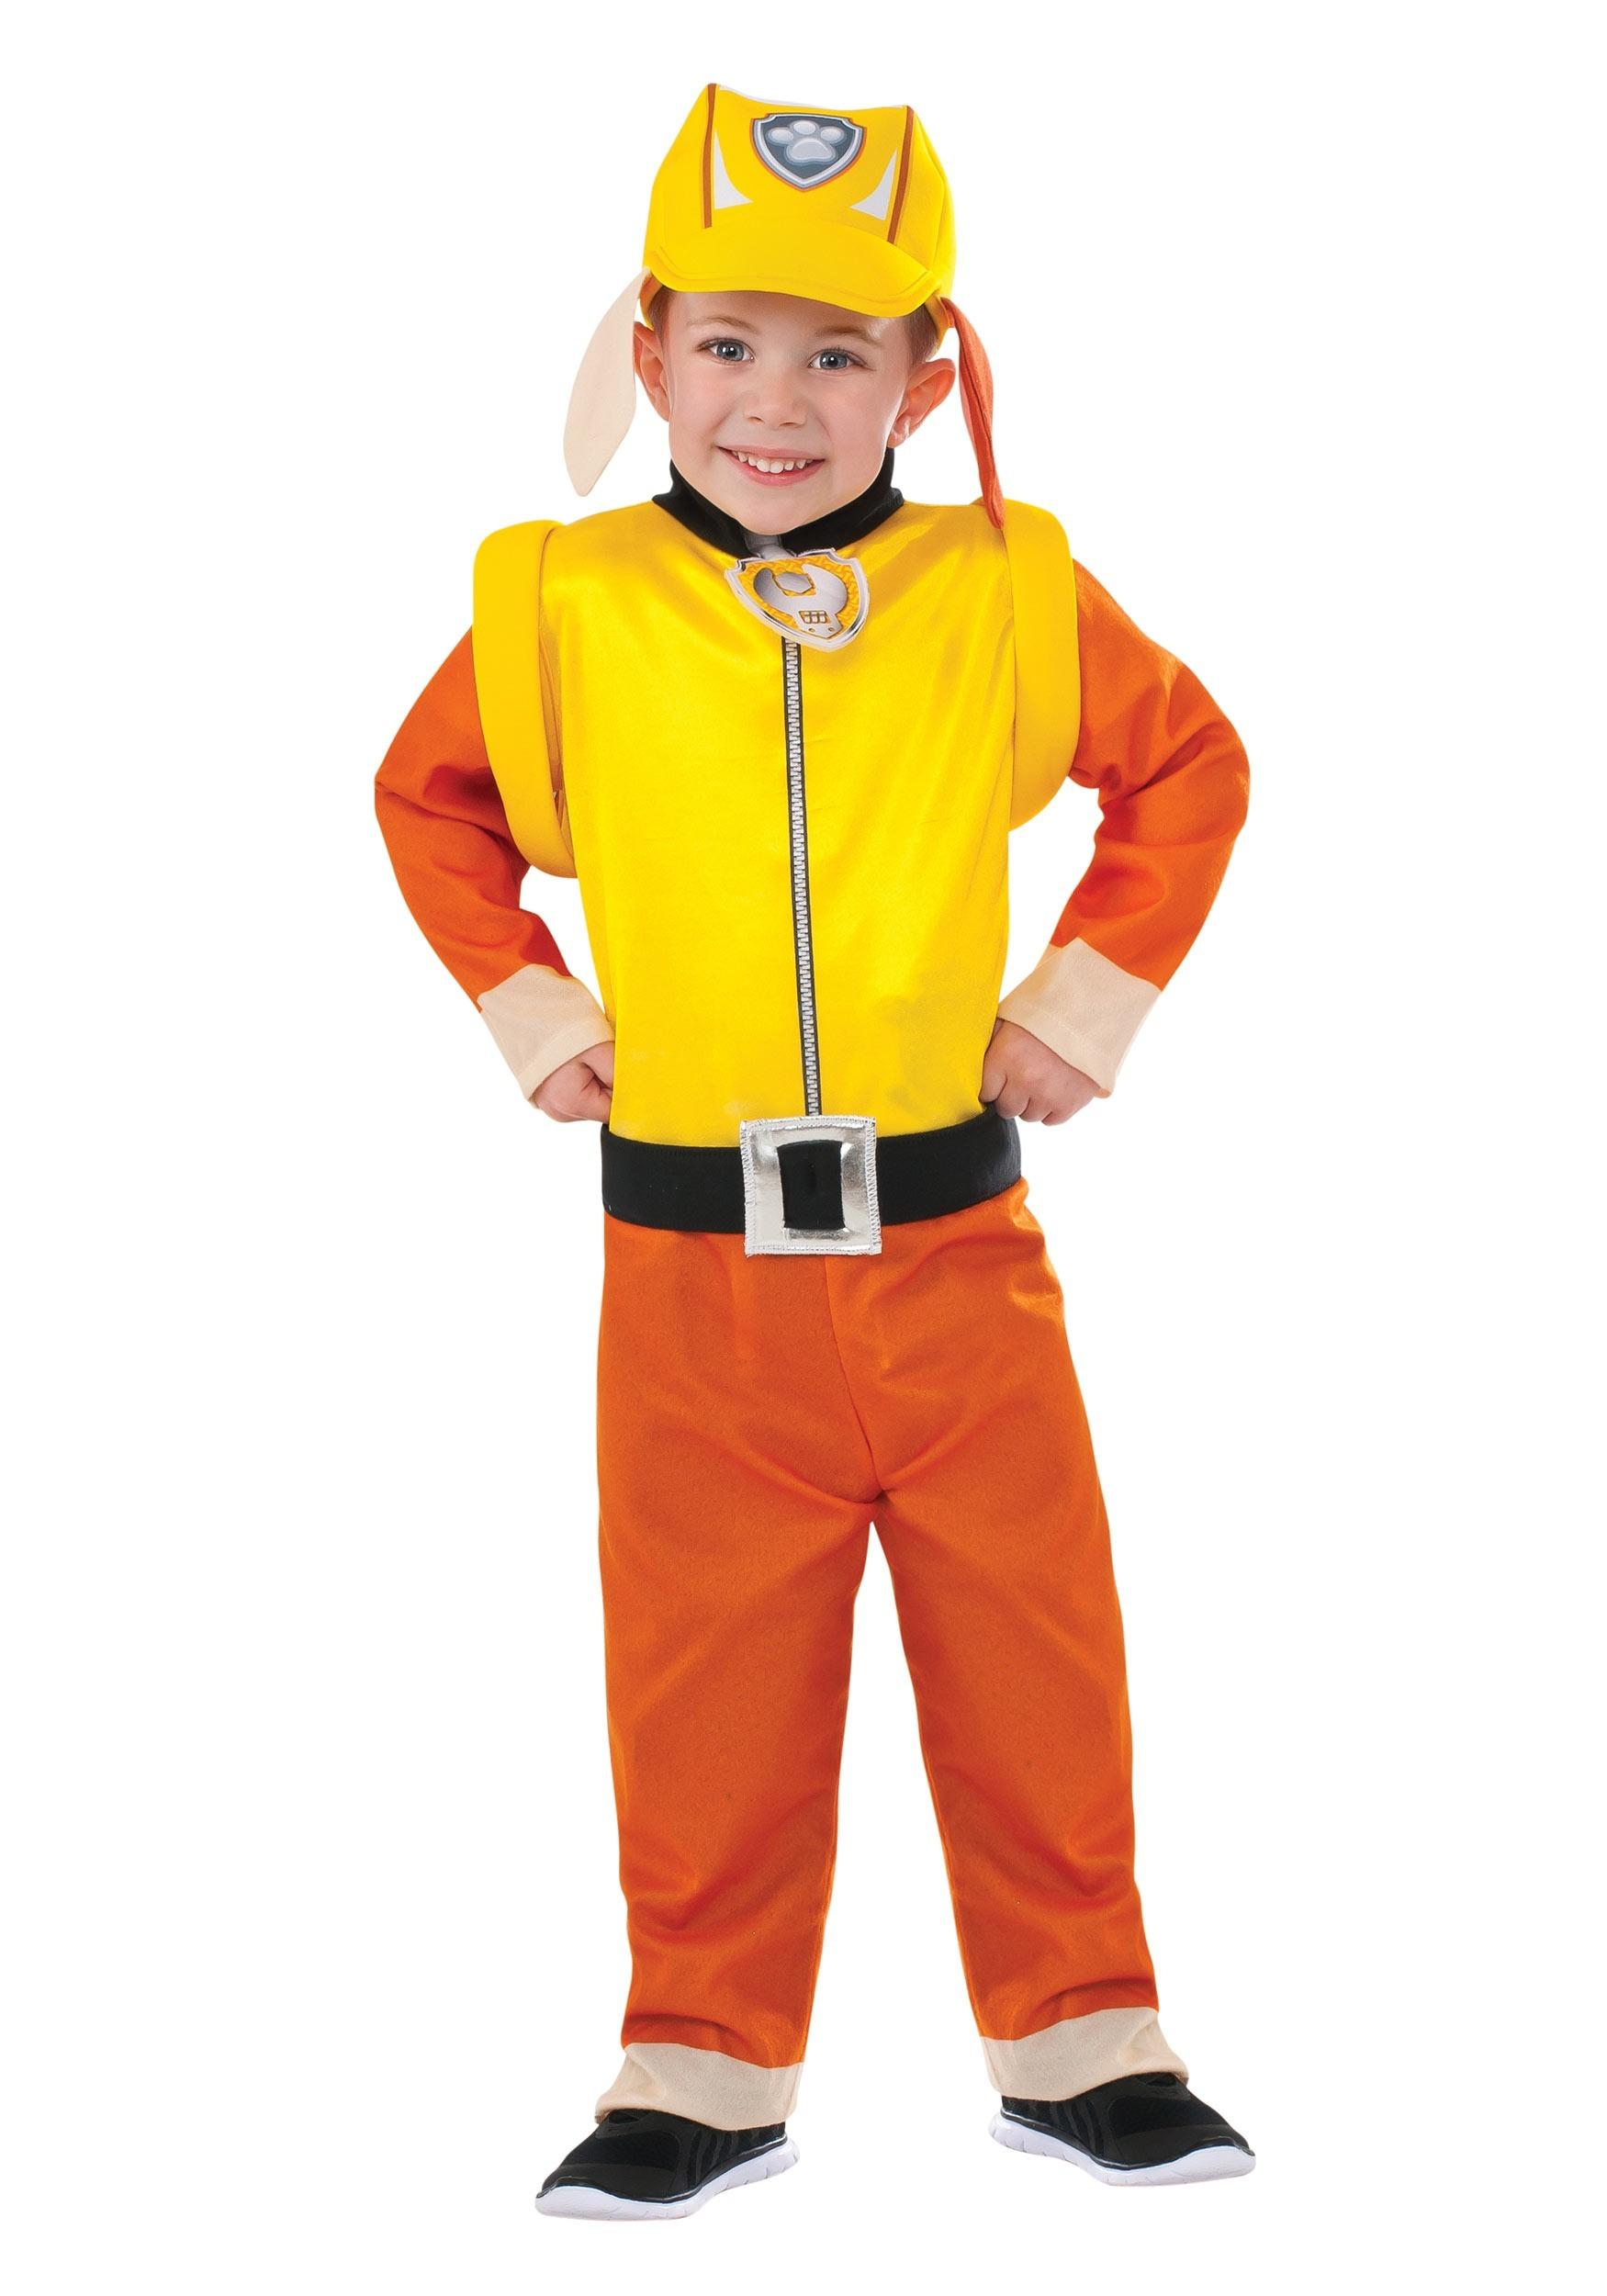 nickelodeon paw patrol halloween costumes for kids. Black Bedroom Furniture Sets. Home Design Ideas